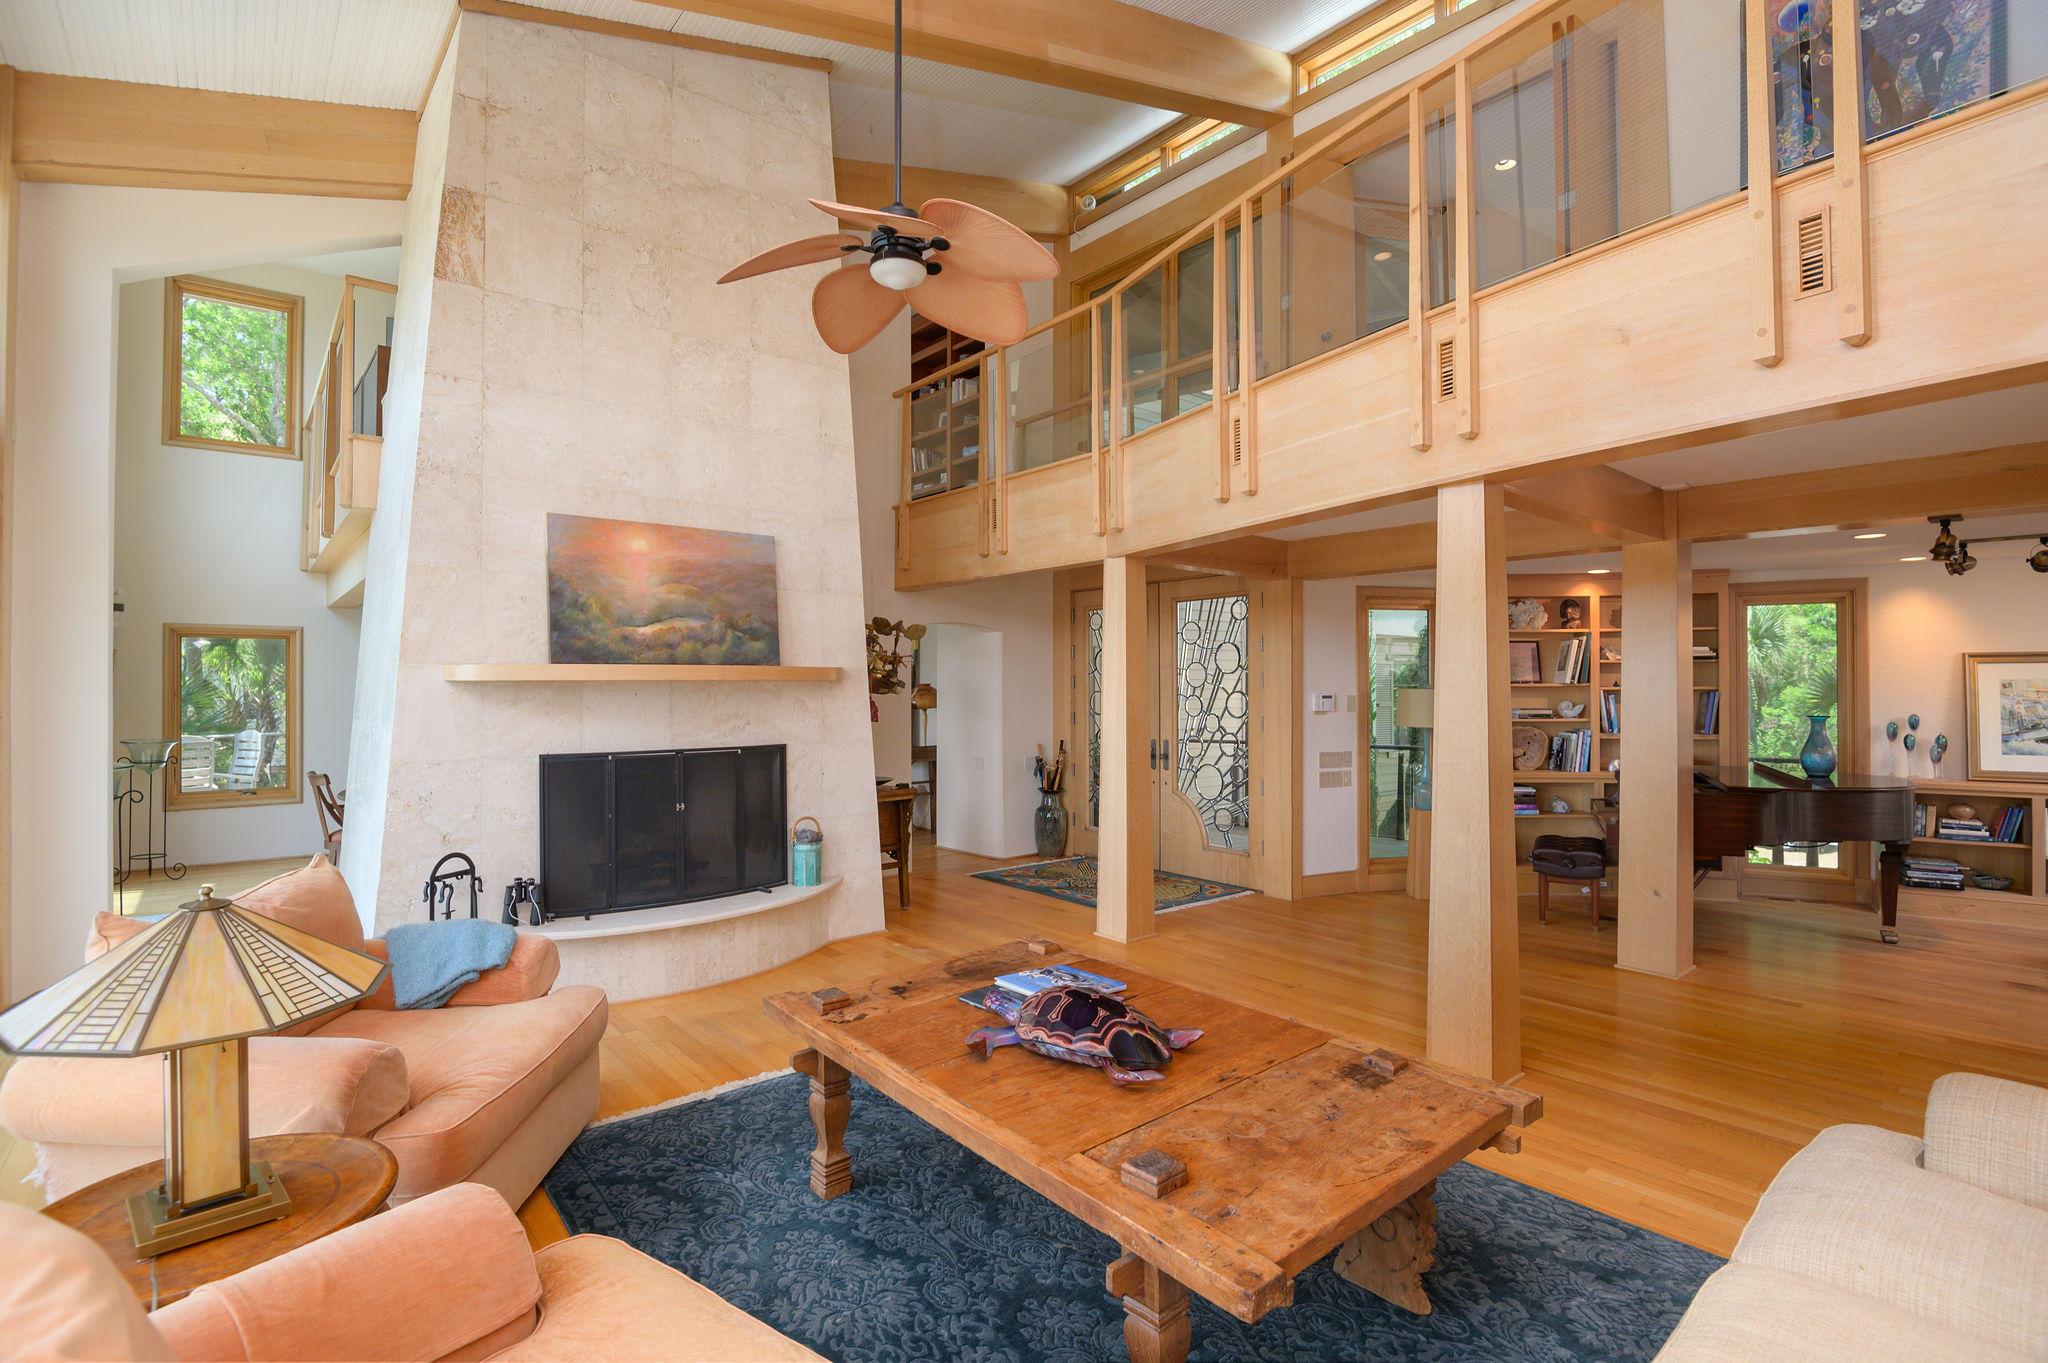 Seabrook Island Homes For Sale - 3087 Marshgate, Seabrook Island, SC - 35